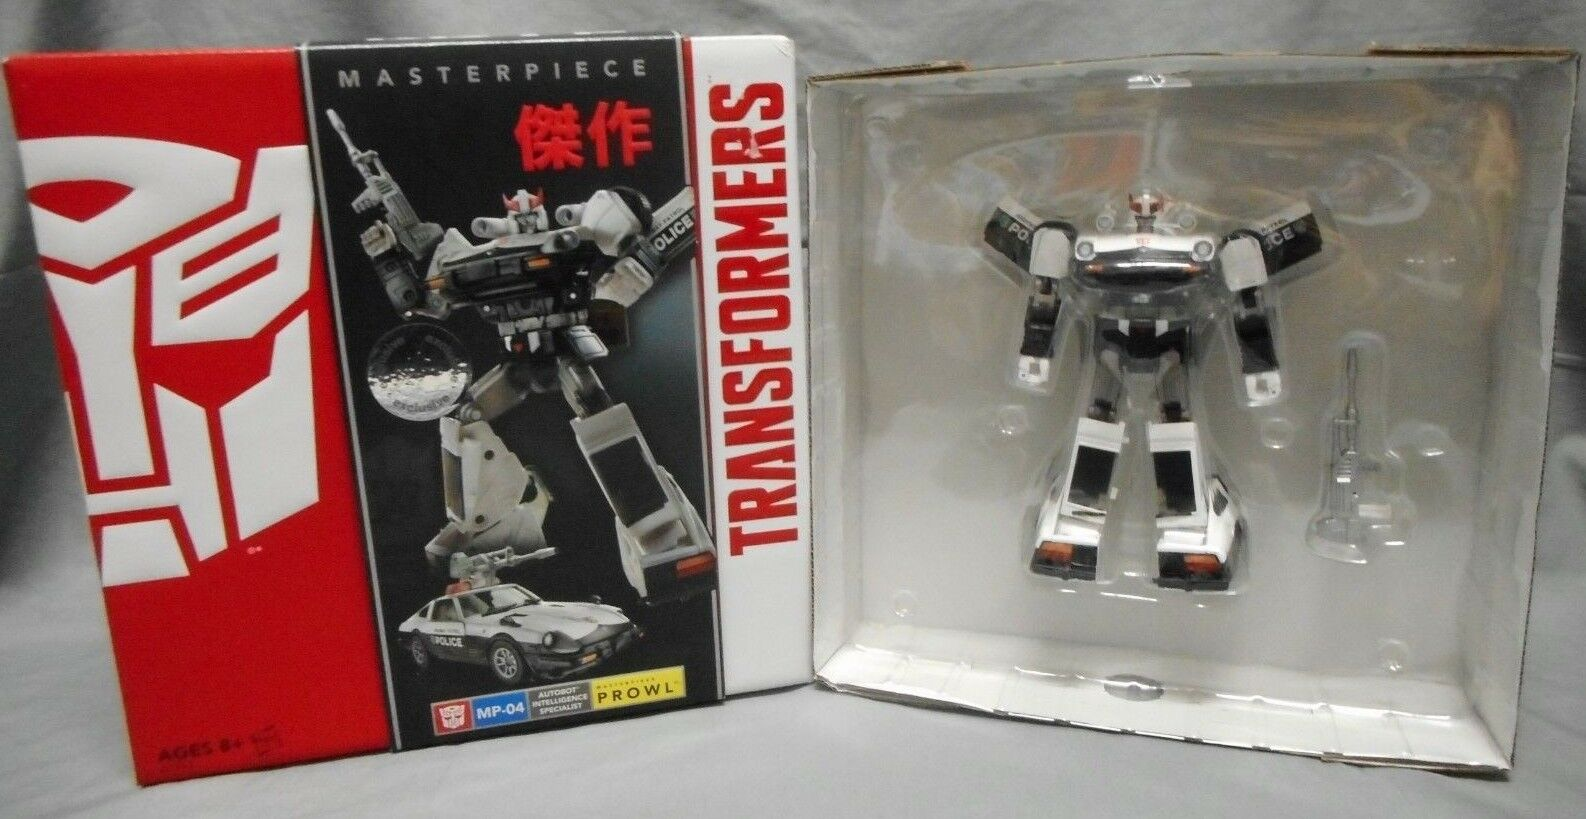 Transformers Masterpiece MP-04 Autobot acecho Juguetes R Us Exclusive Hasbro